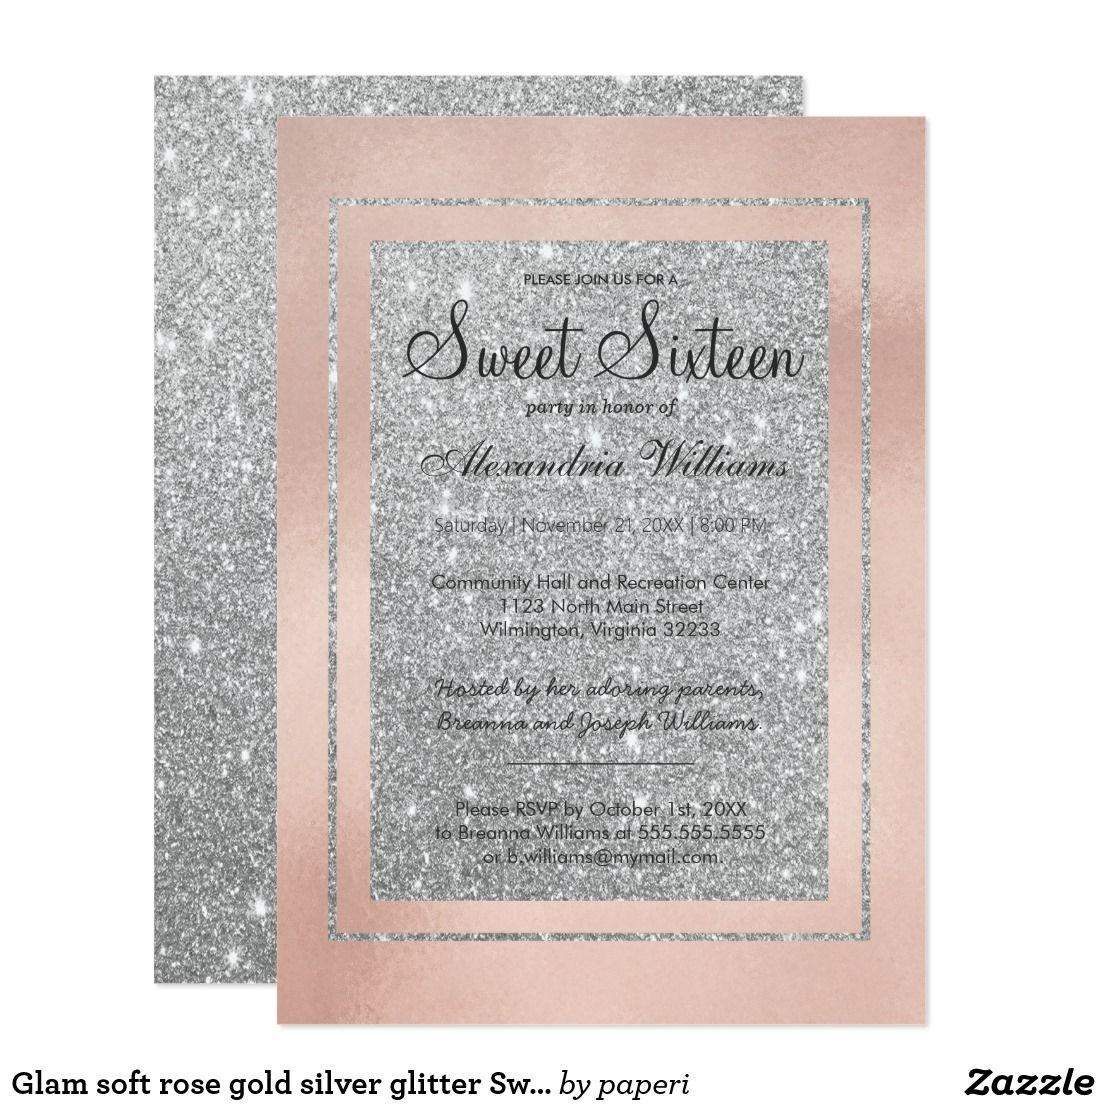 Glam Soft Rose Gold Silver Glitter